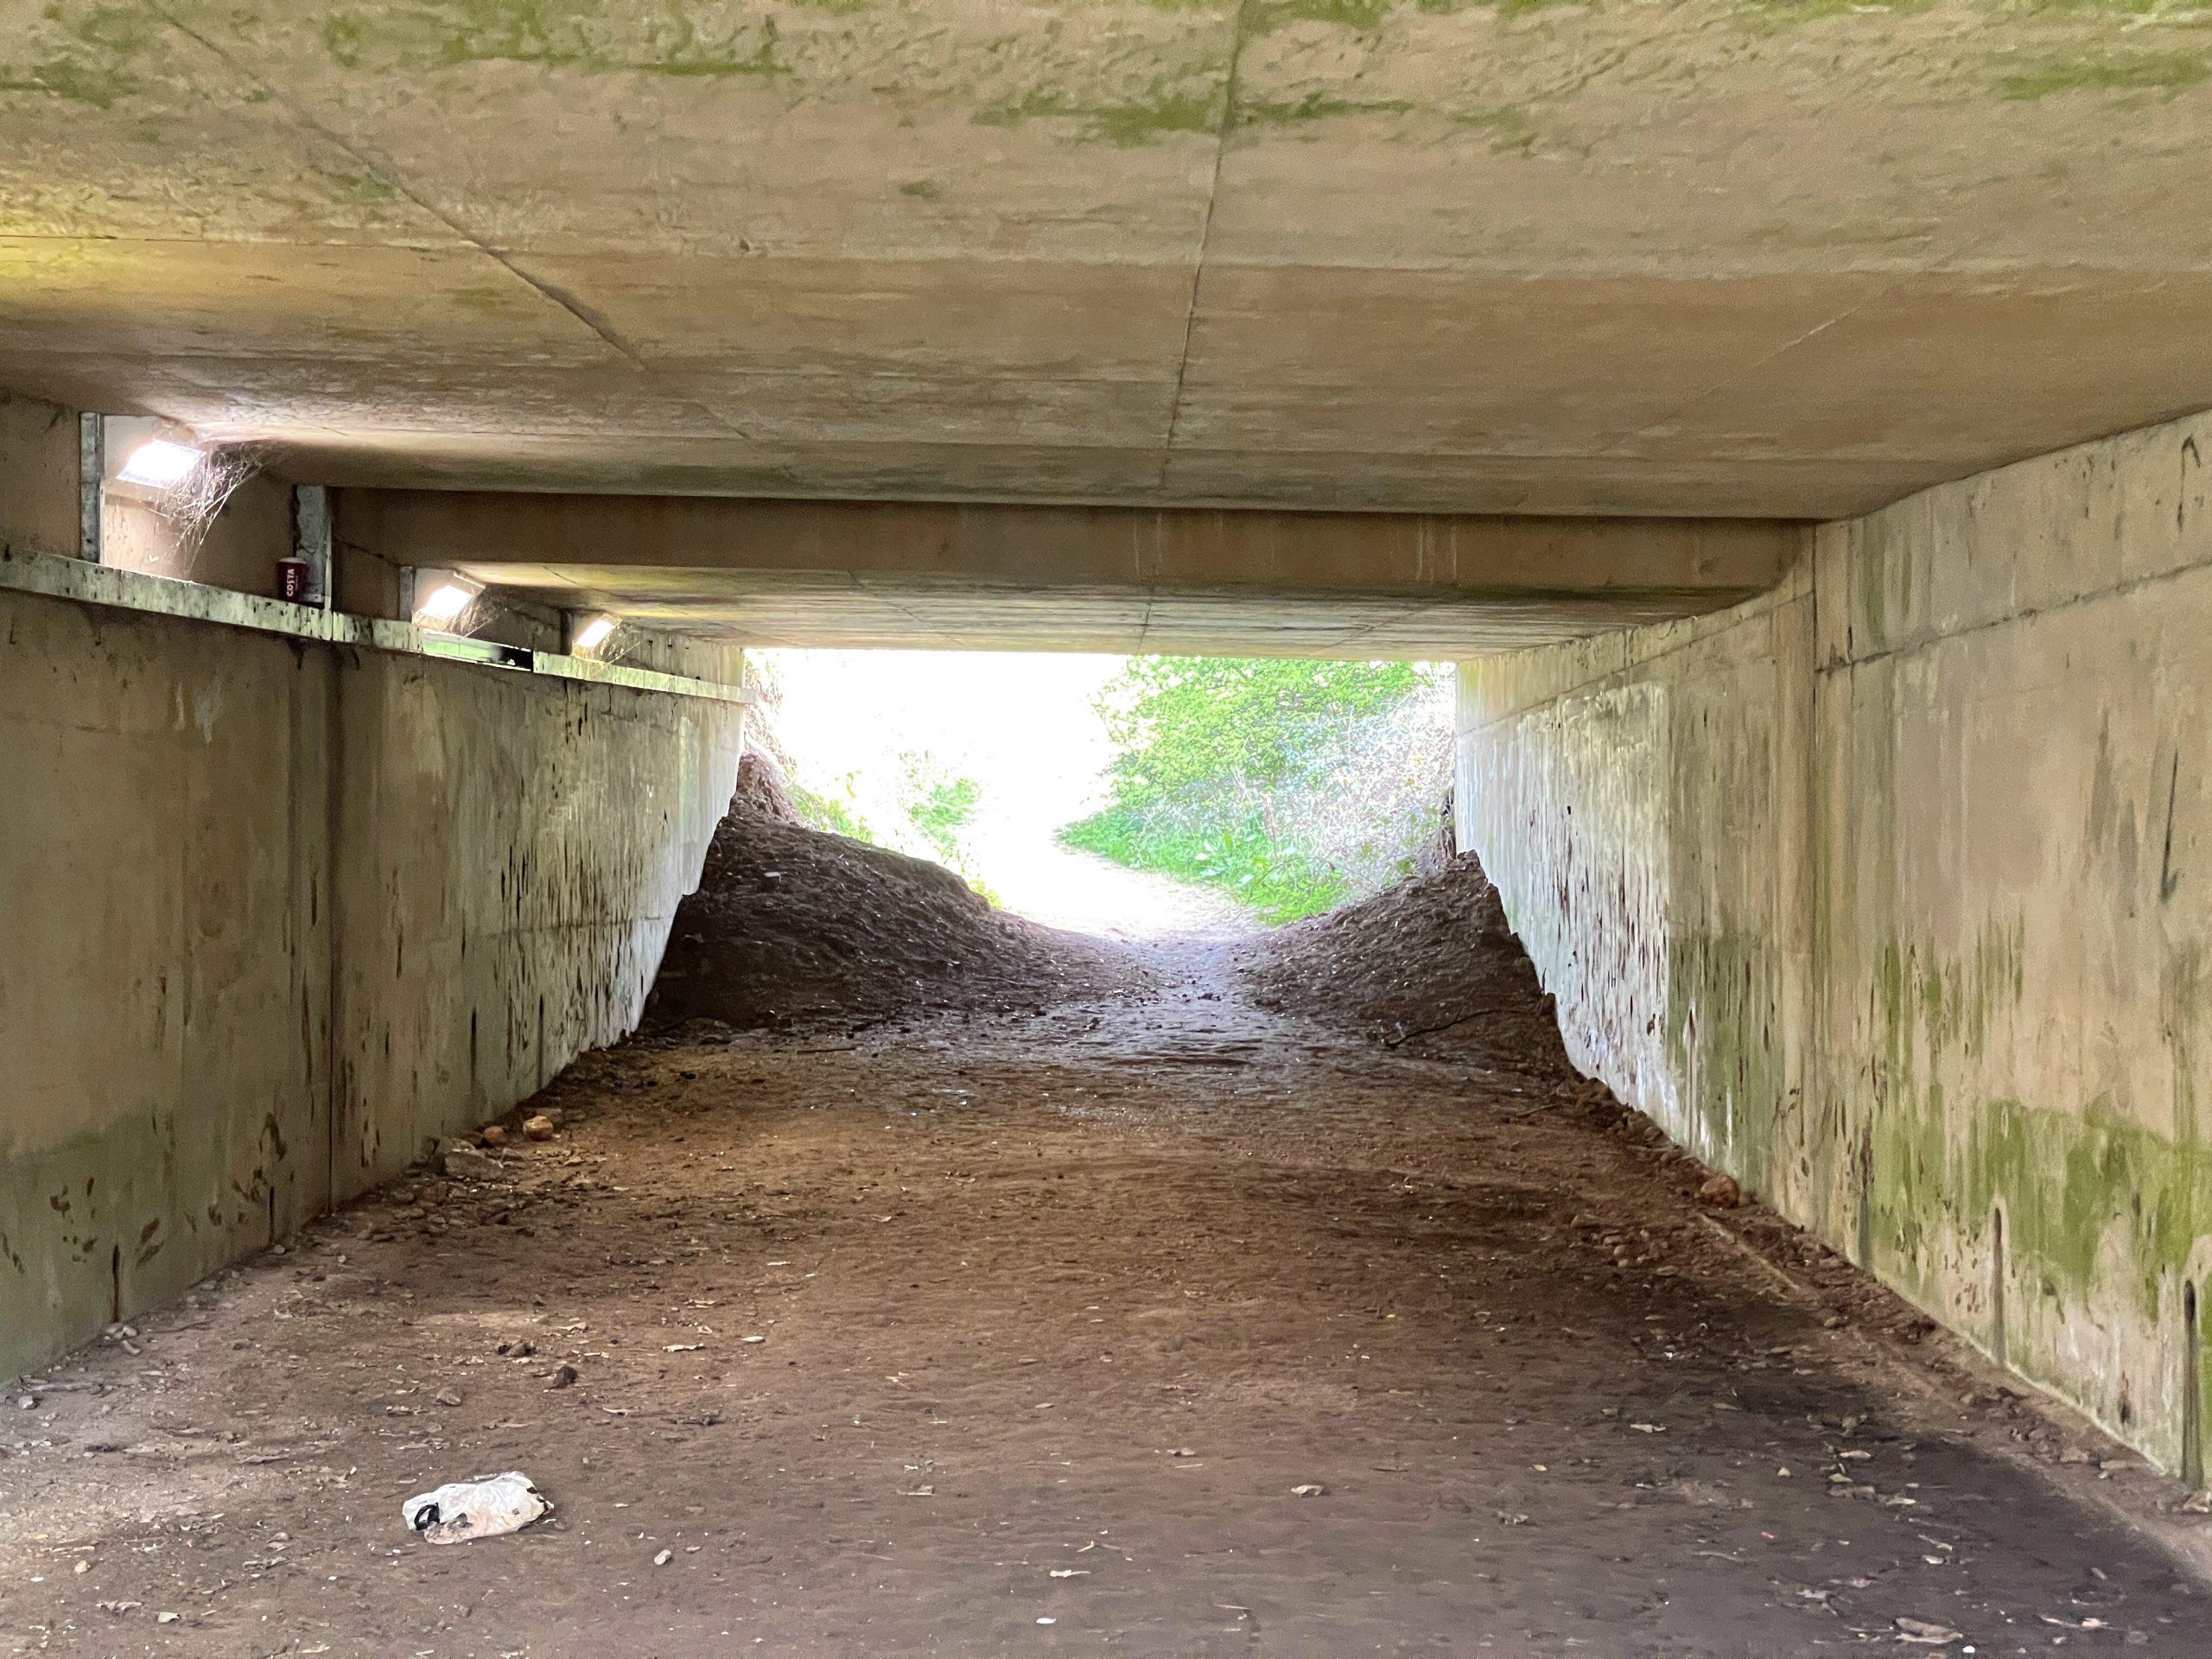 Underpass underneath the A52 ©westbridgfordwire.com